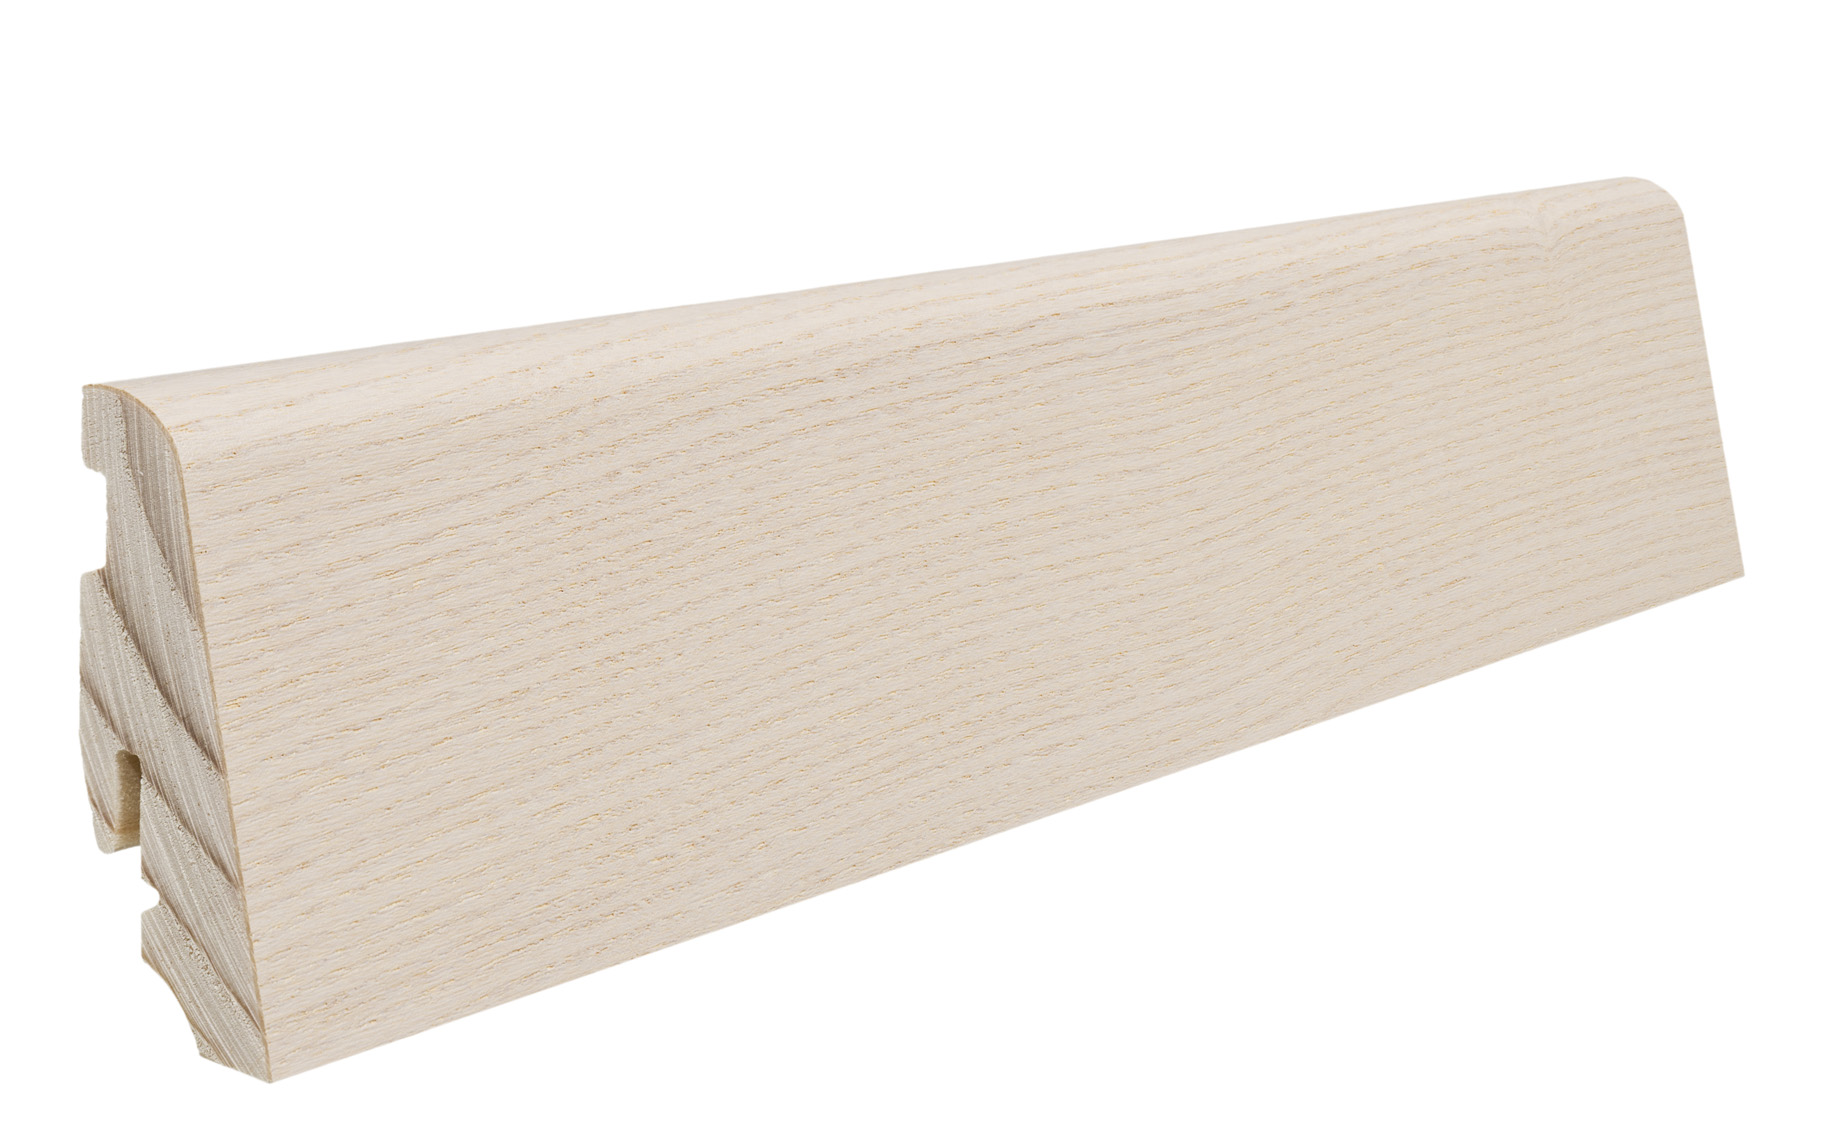 408684 haro fussleiste esche arcticweiss lackiert 19 x 58 mm. Black Bedroom Furniture Sets. Home Design Ideas